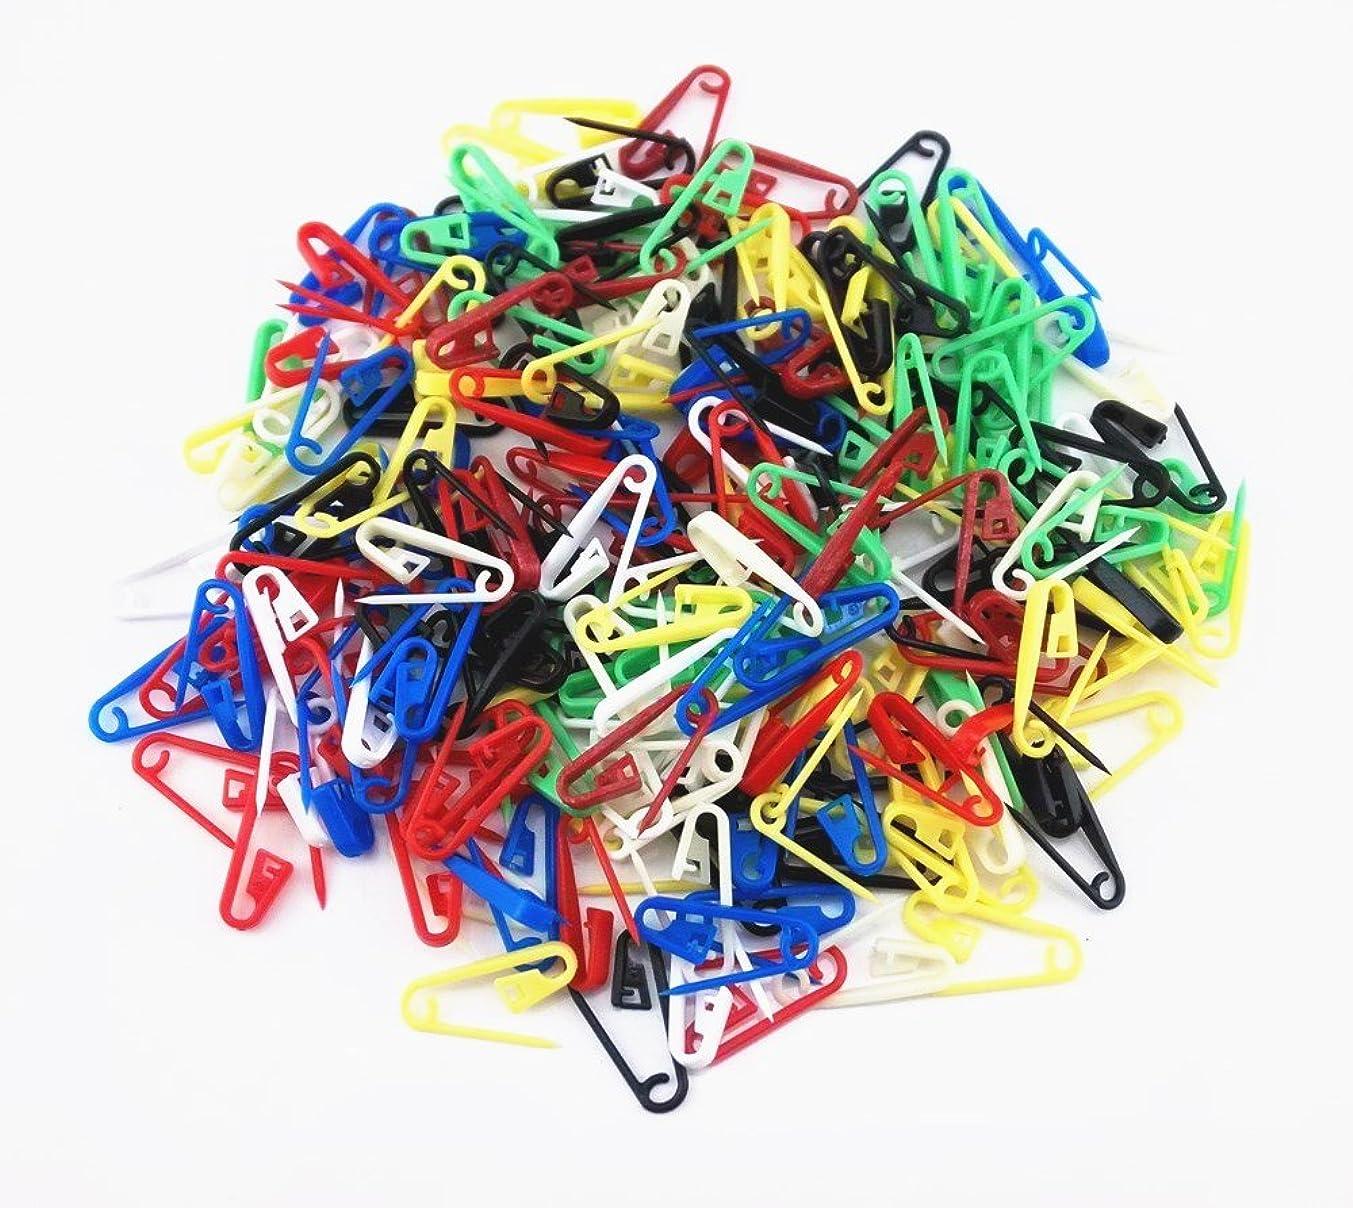 Honbay 200pcs Mix Color Knitting Crochet Locking Stitch Markers Needle Clips